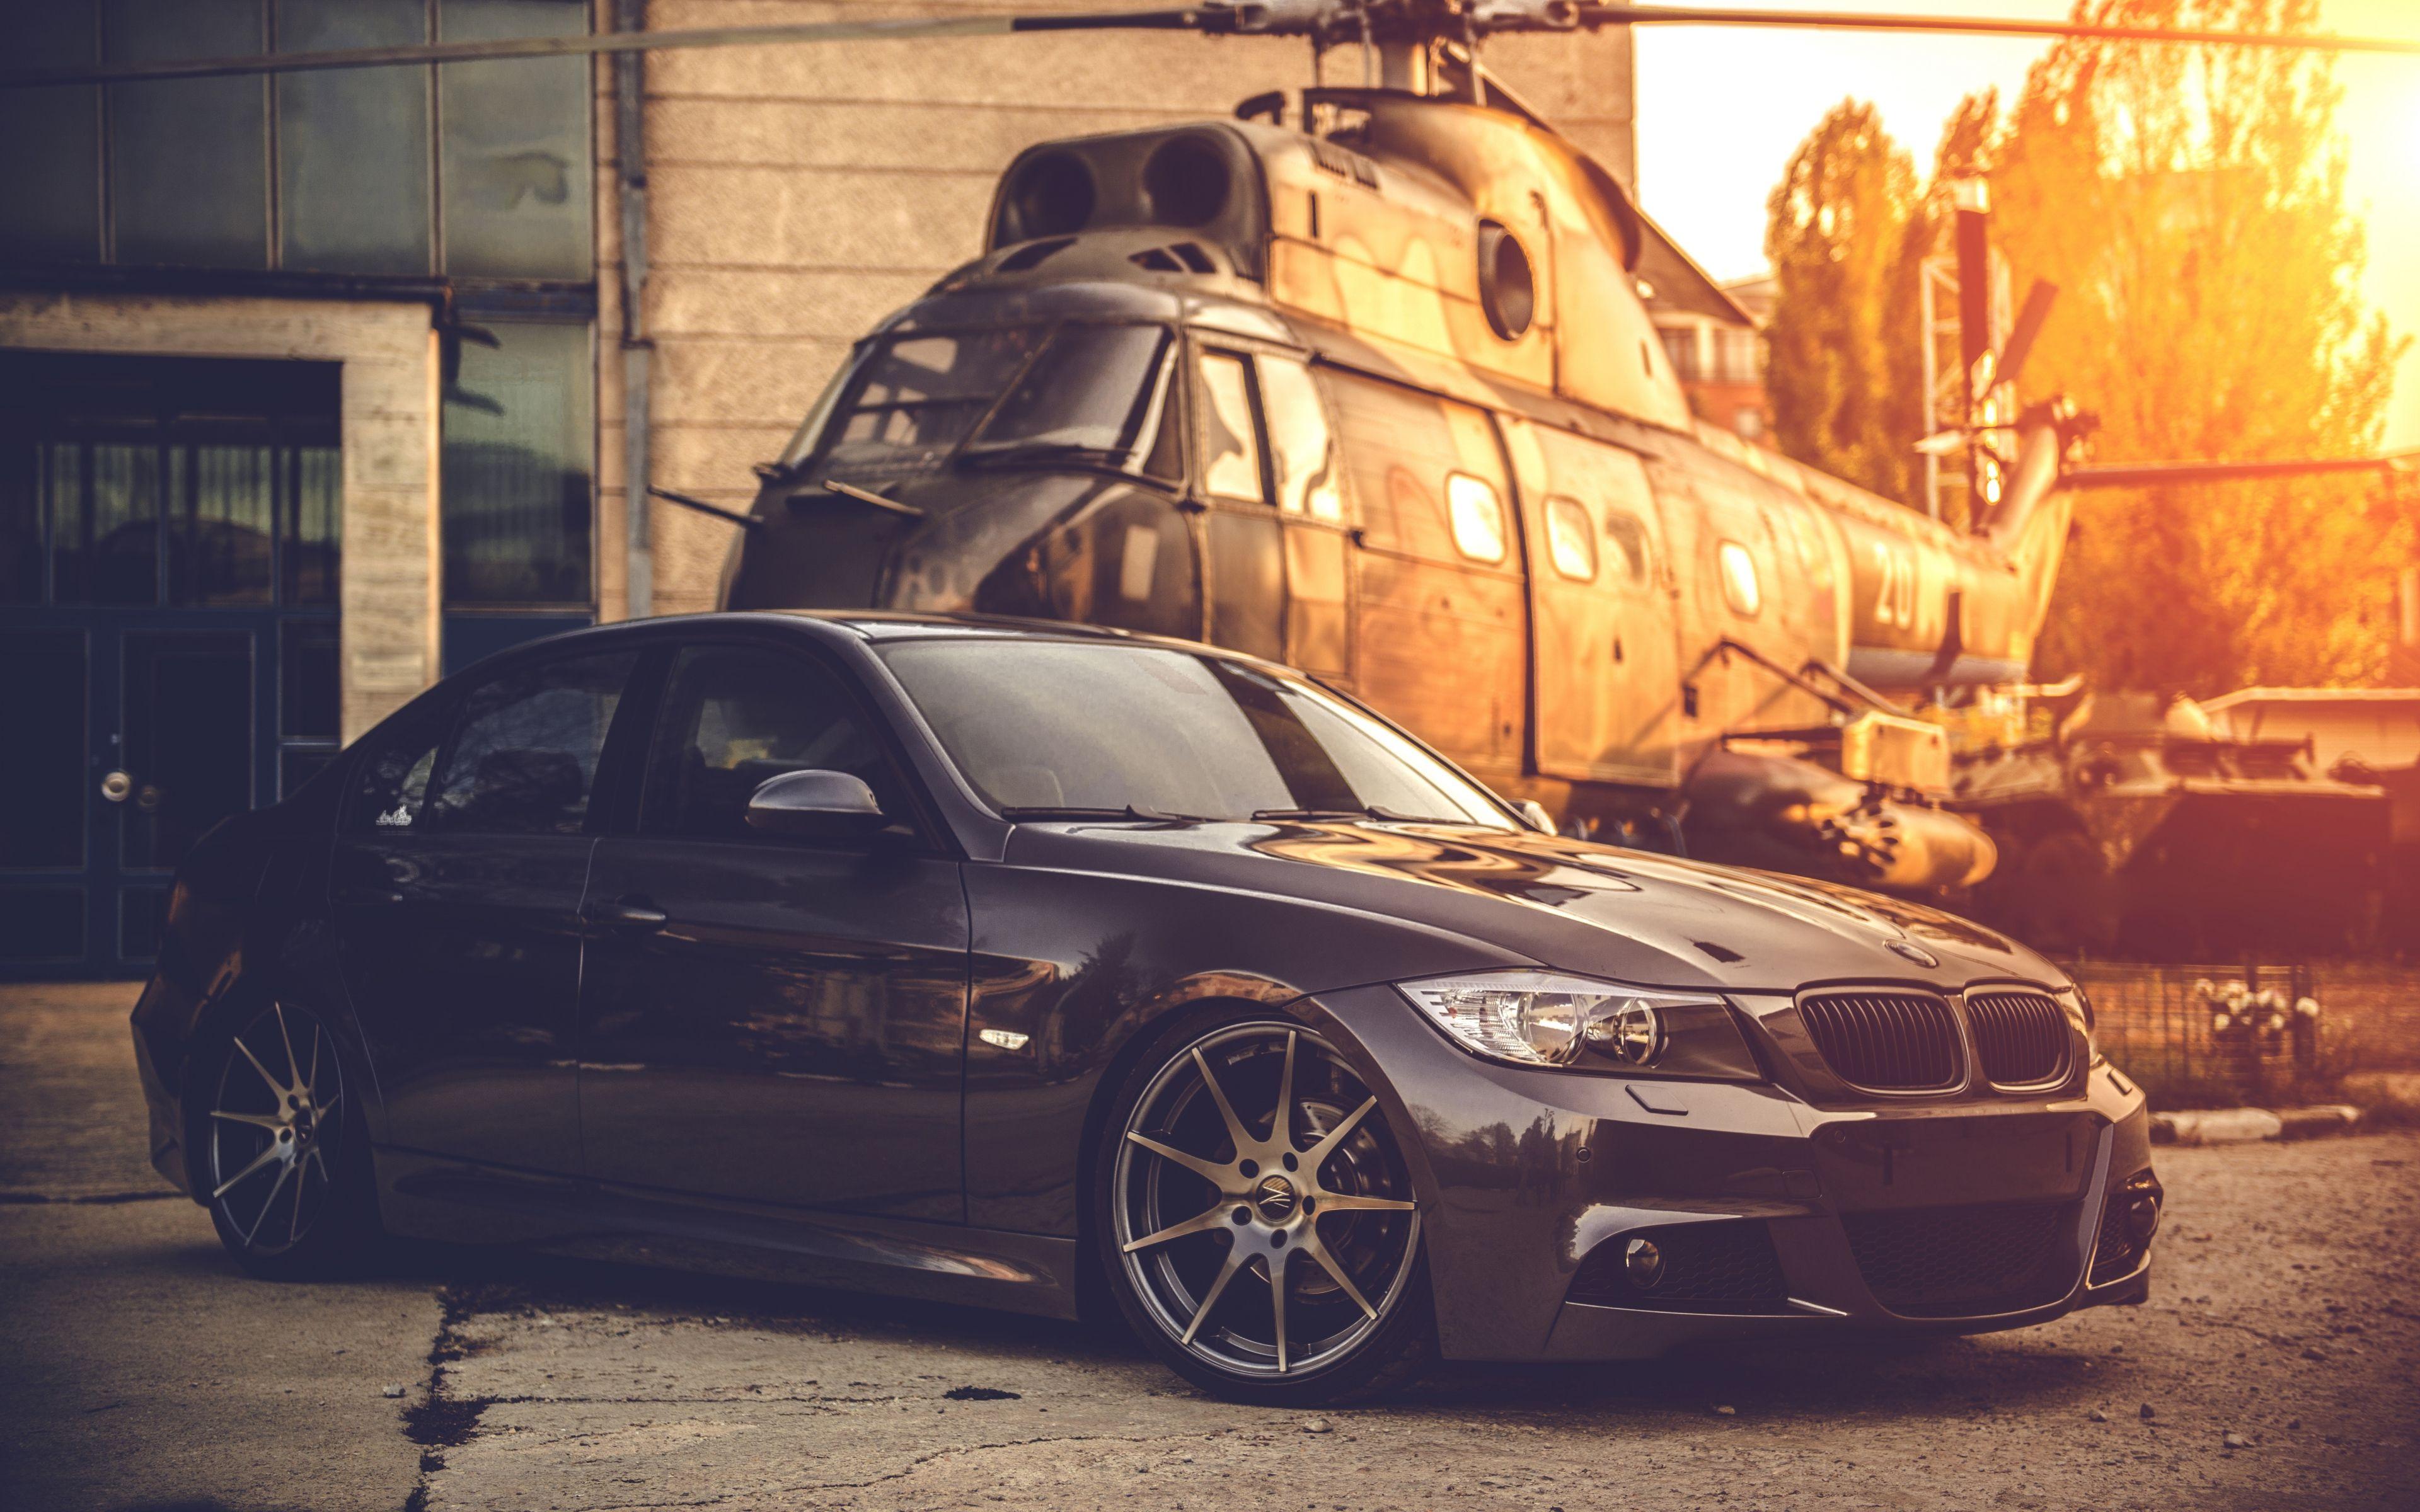 ultra hd 4k cars wallpapers, desktop backgrounds hd downloads all